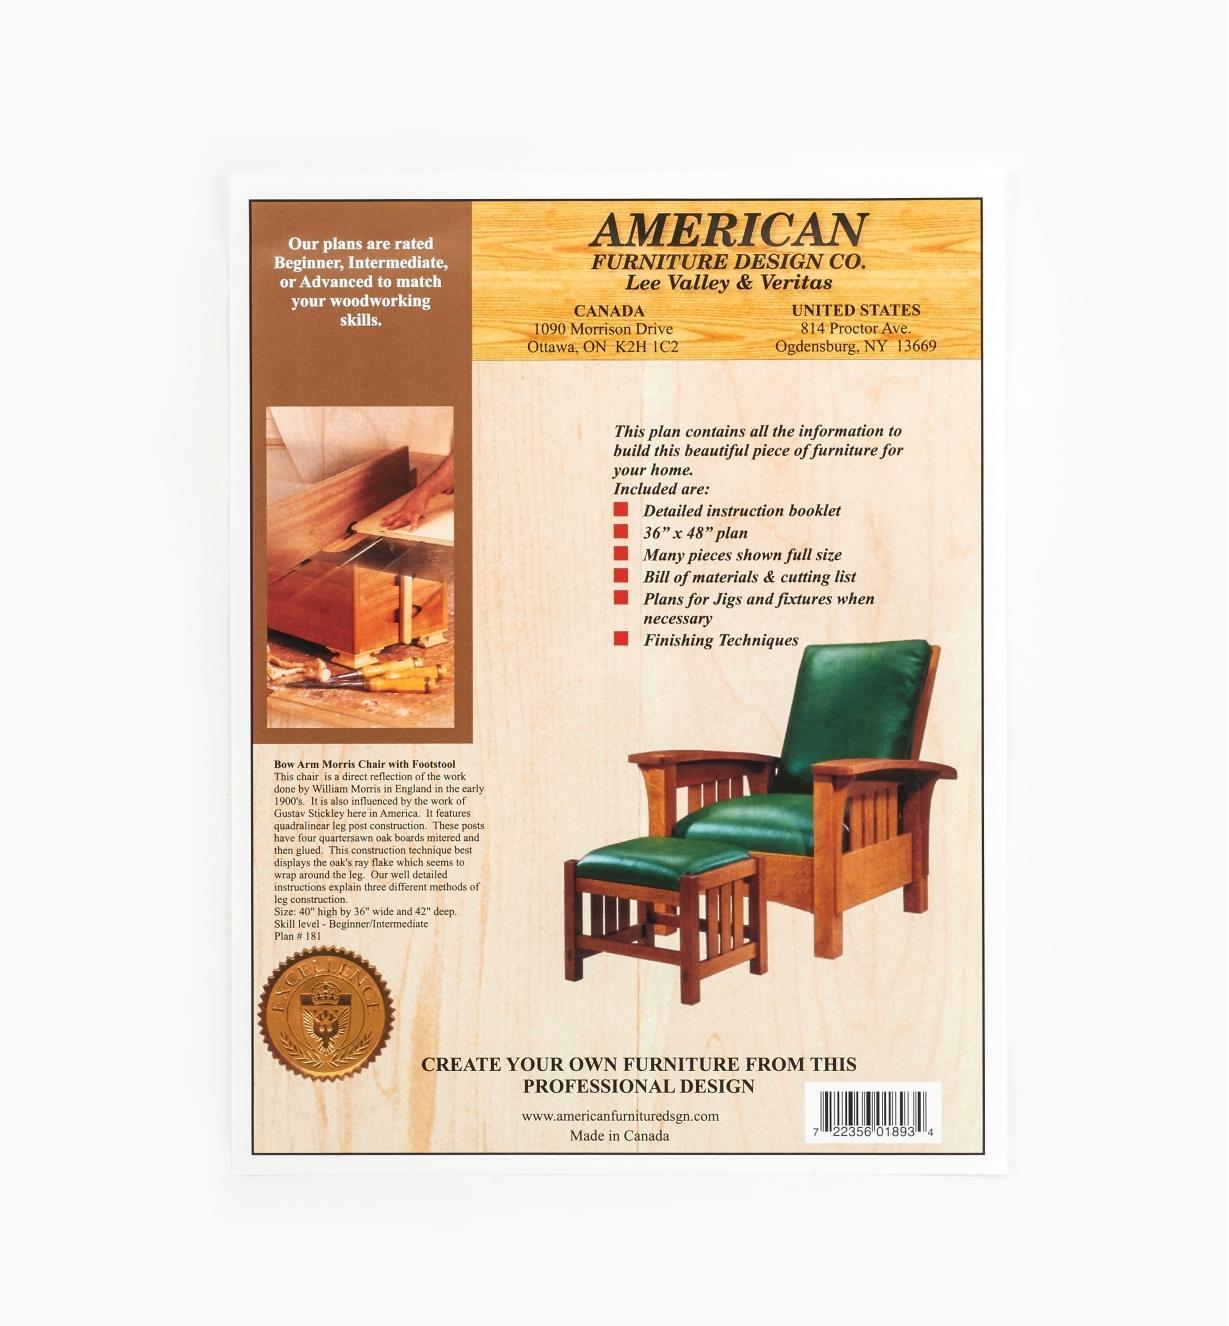 01L5022 - Bow Arm Morris Chair & Footstool Plan